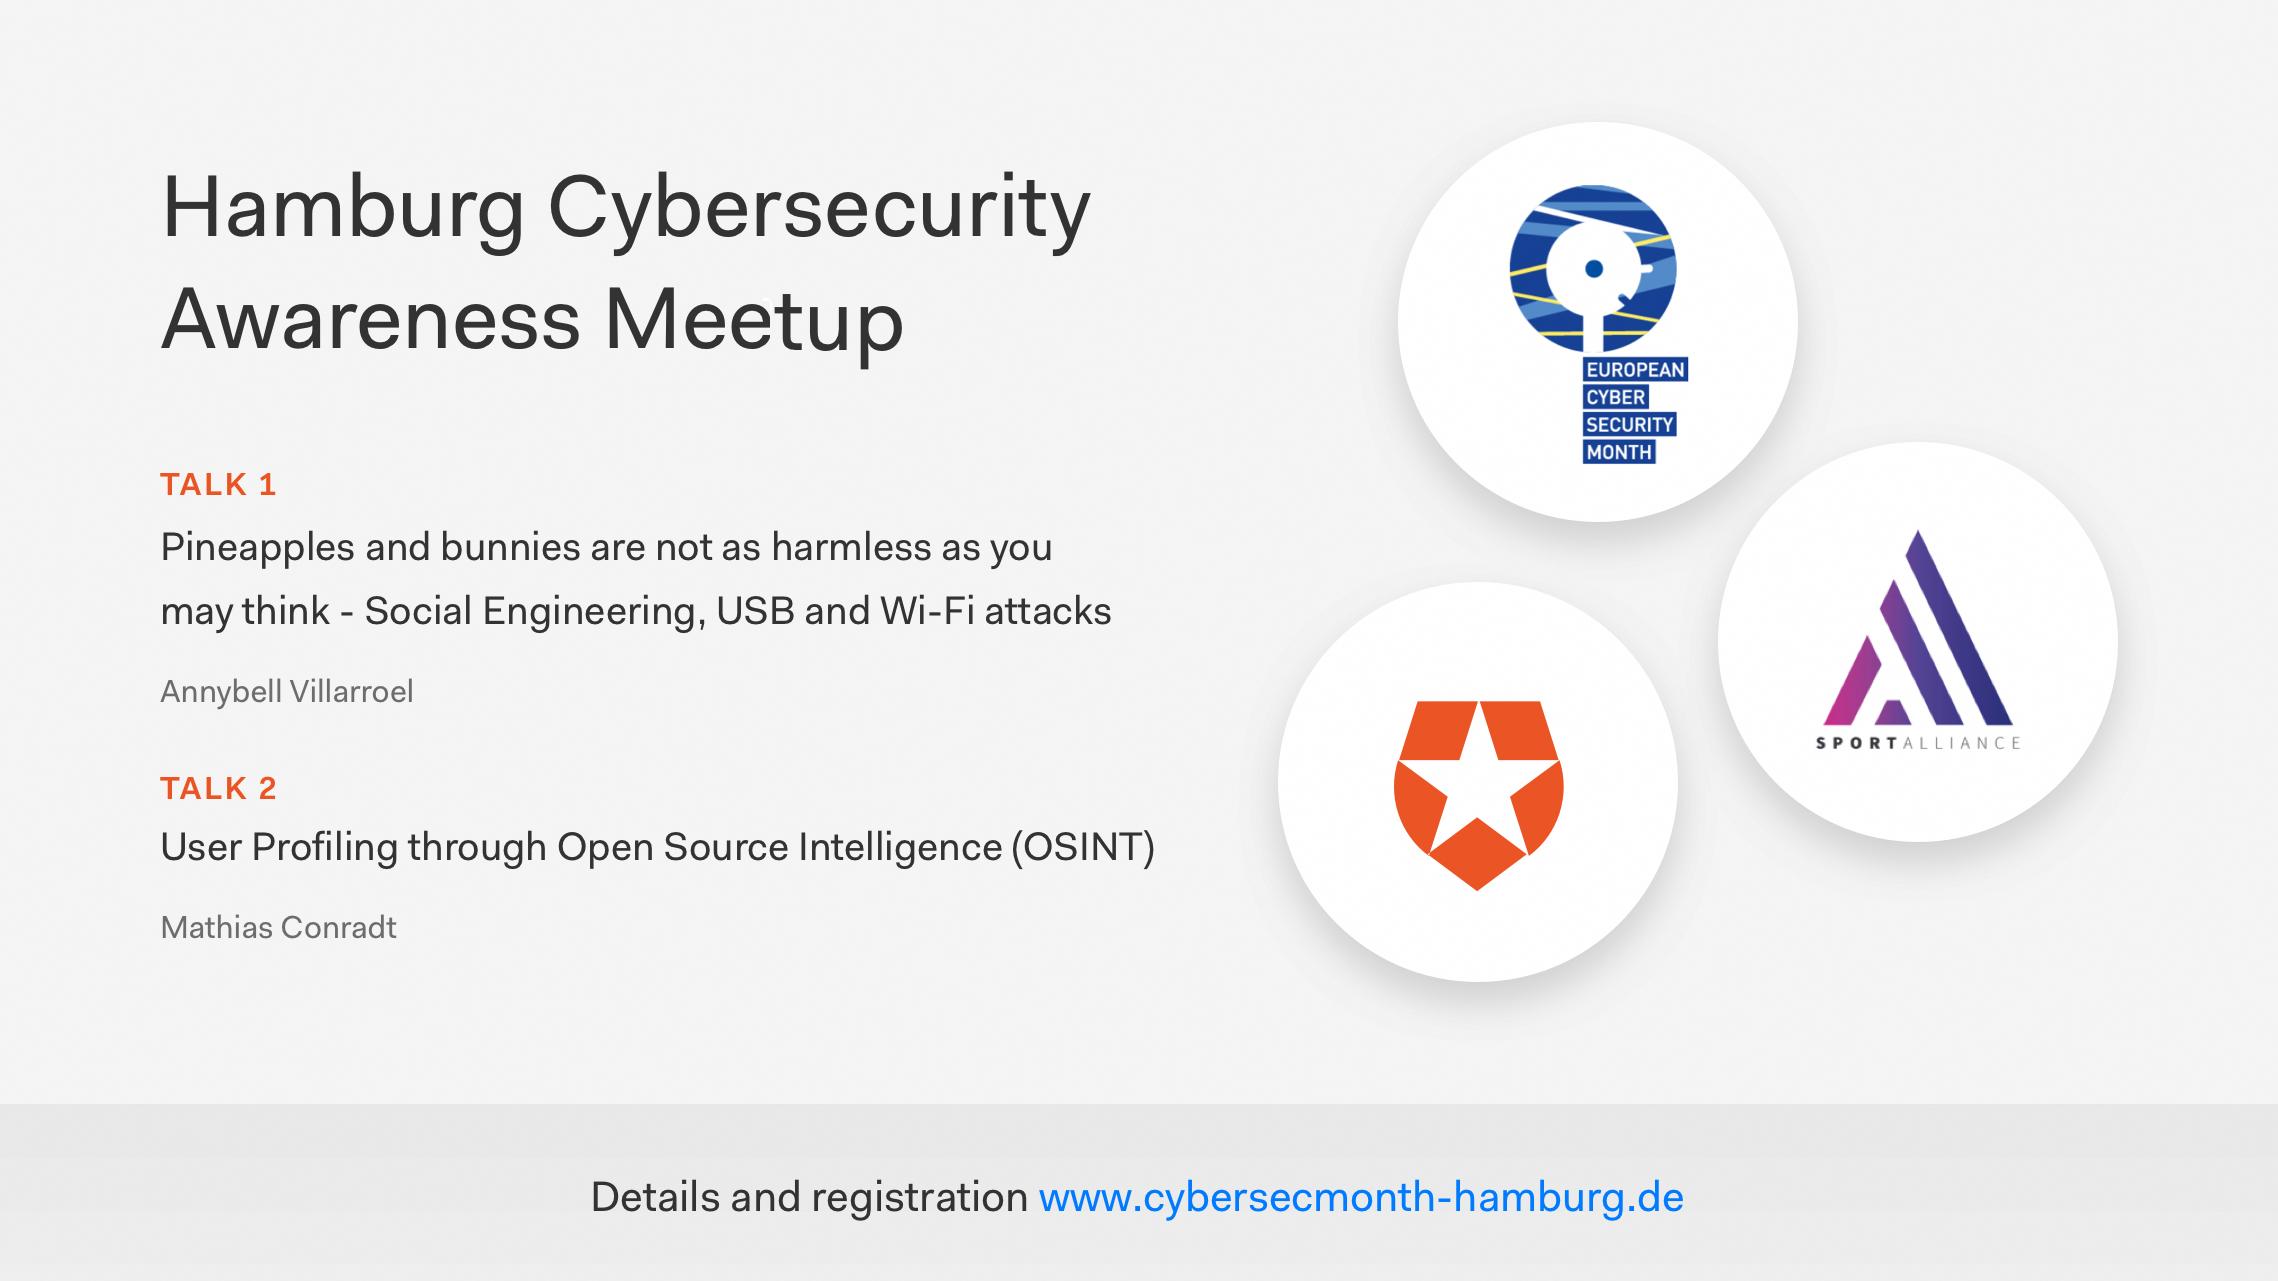 Hamburg Cybersecurity Awareness Month 2019